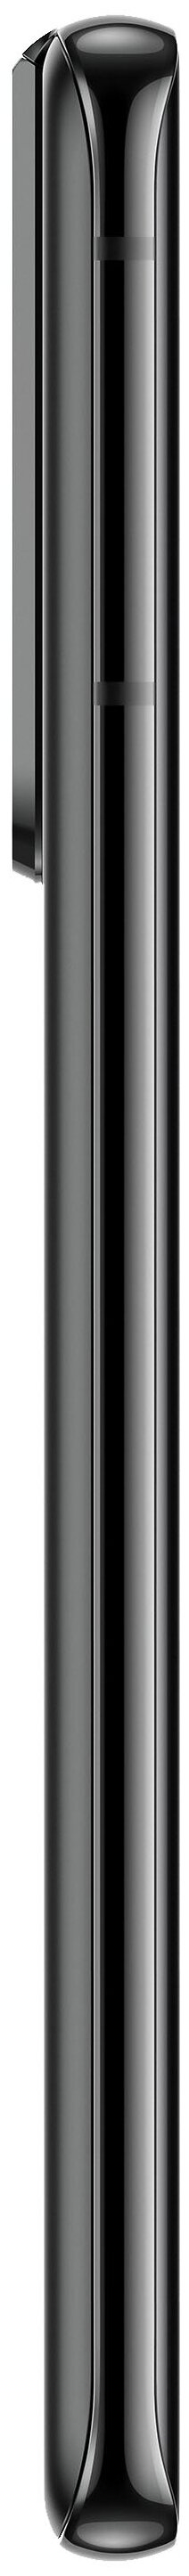 Samsung Galaxy S21 Ultra 5G 16/512GB - операционная система: Android 11